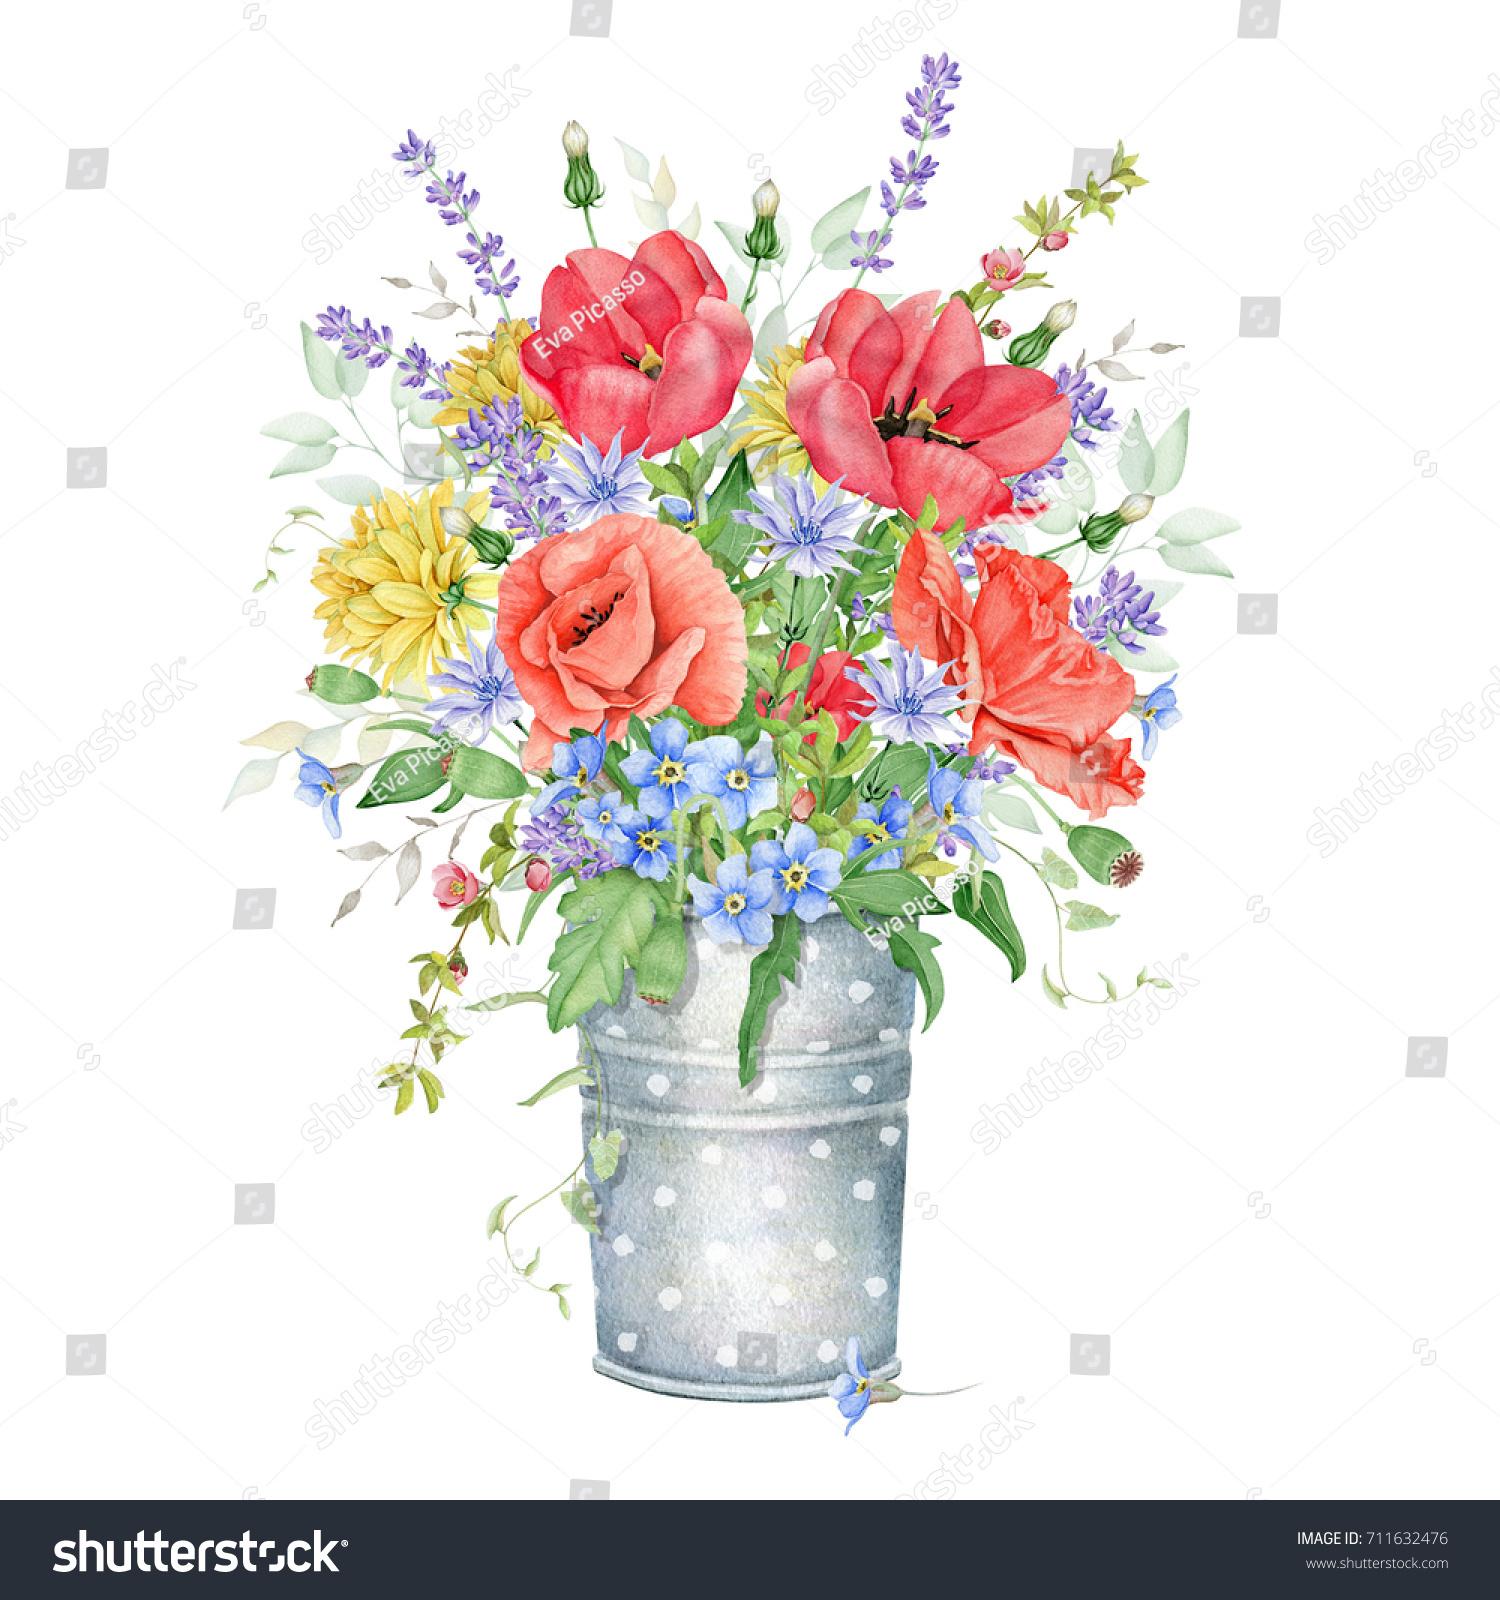 Watercolor Floral Bouquet Meadow Flowers Stock Illustration